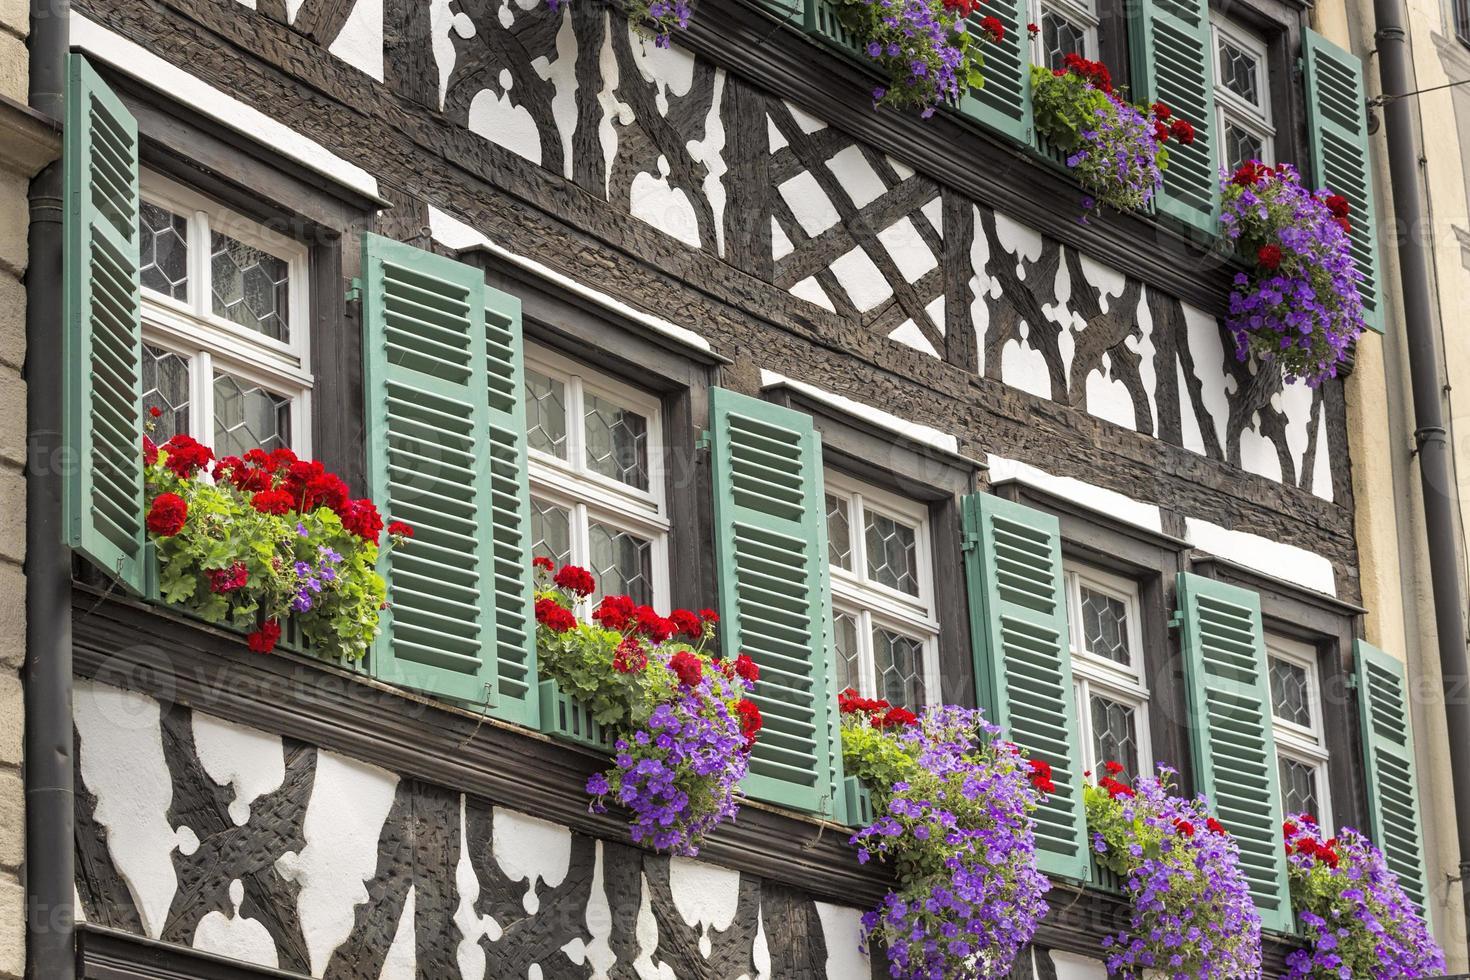 casa a graticcio in alta franconia, germania foto